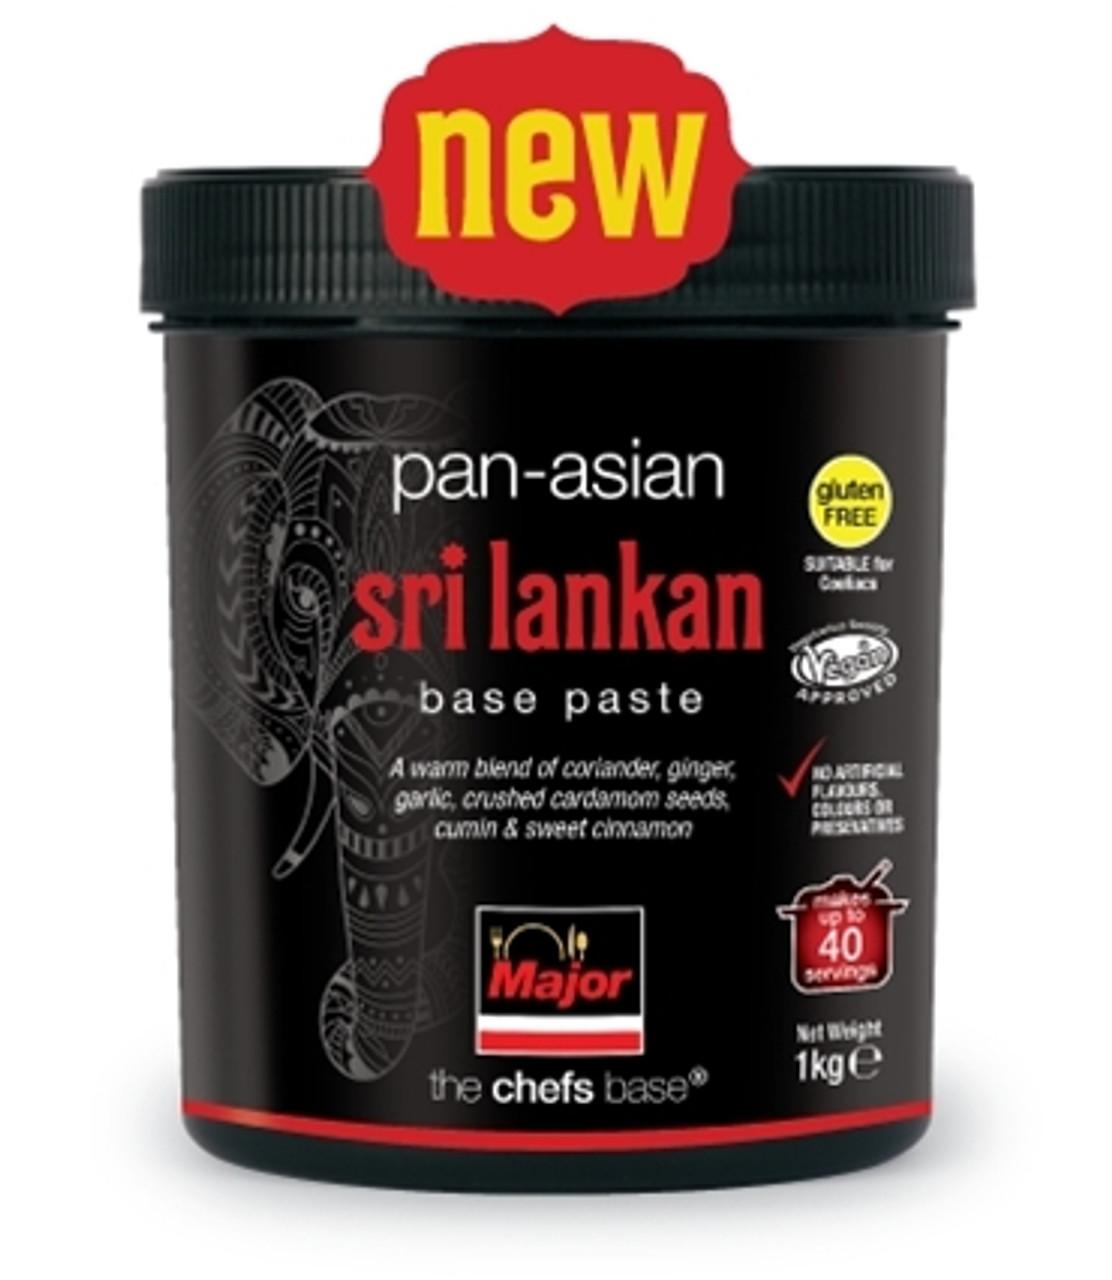 MAJOR PAN- ASIAN BASE SRI LANKAN 1kg